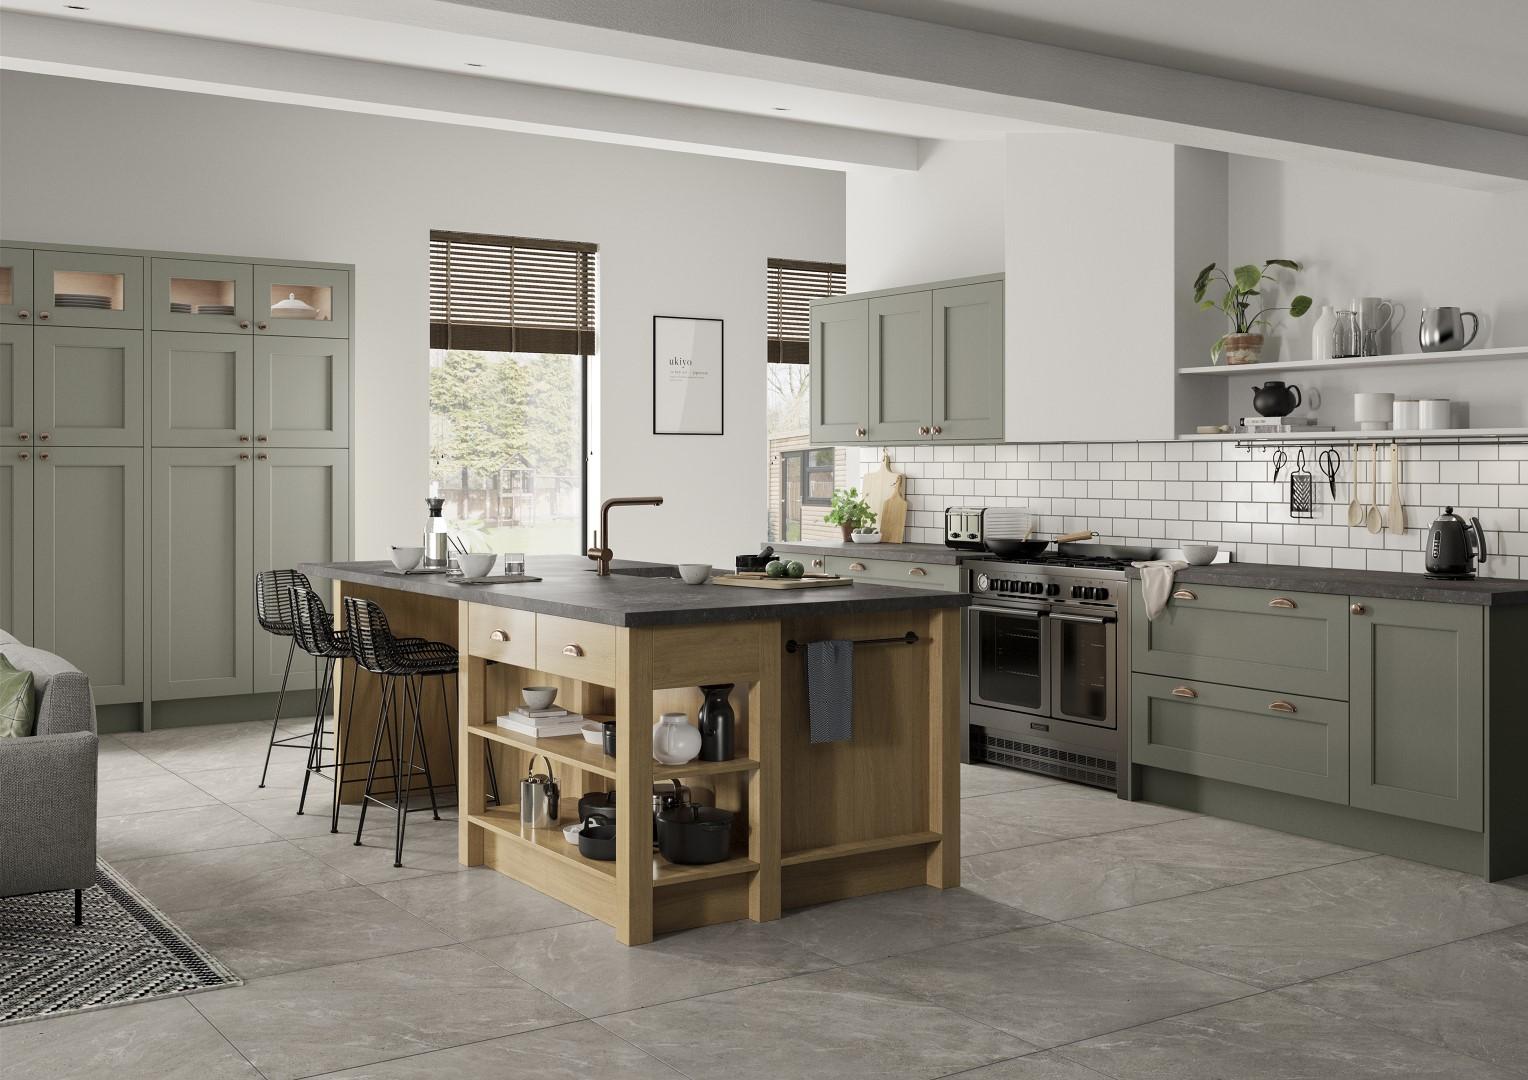 Wakefield Cardamom and Light Oak Kitchen - Kitchen Design - Alan Kelly Kitchens - Waterford